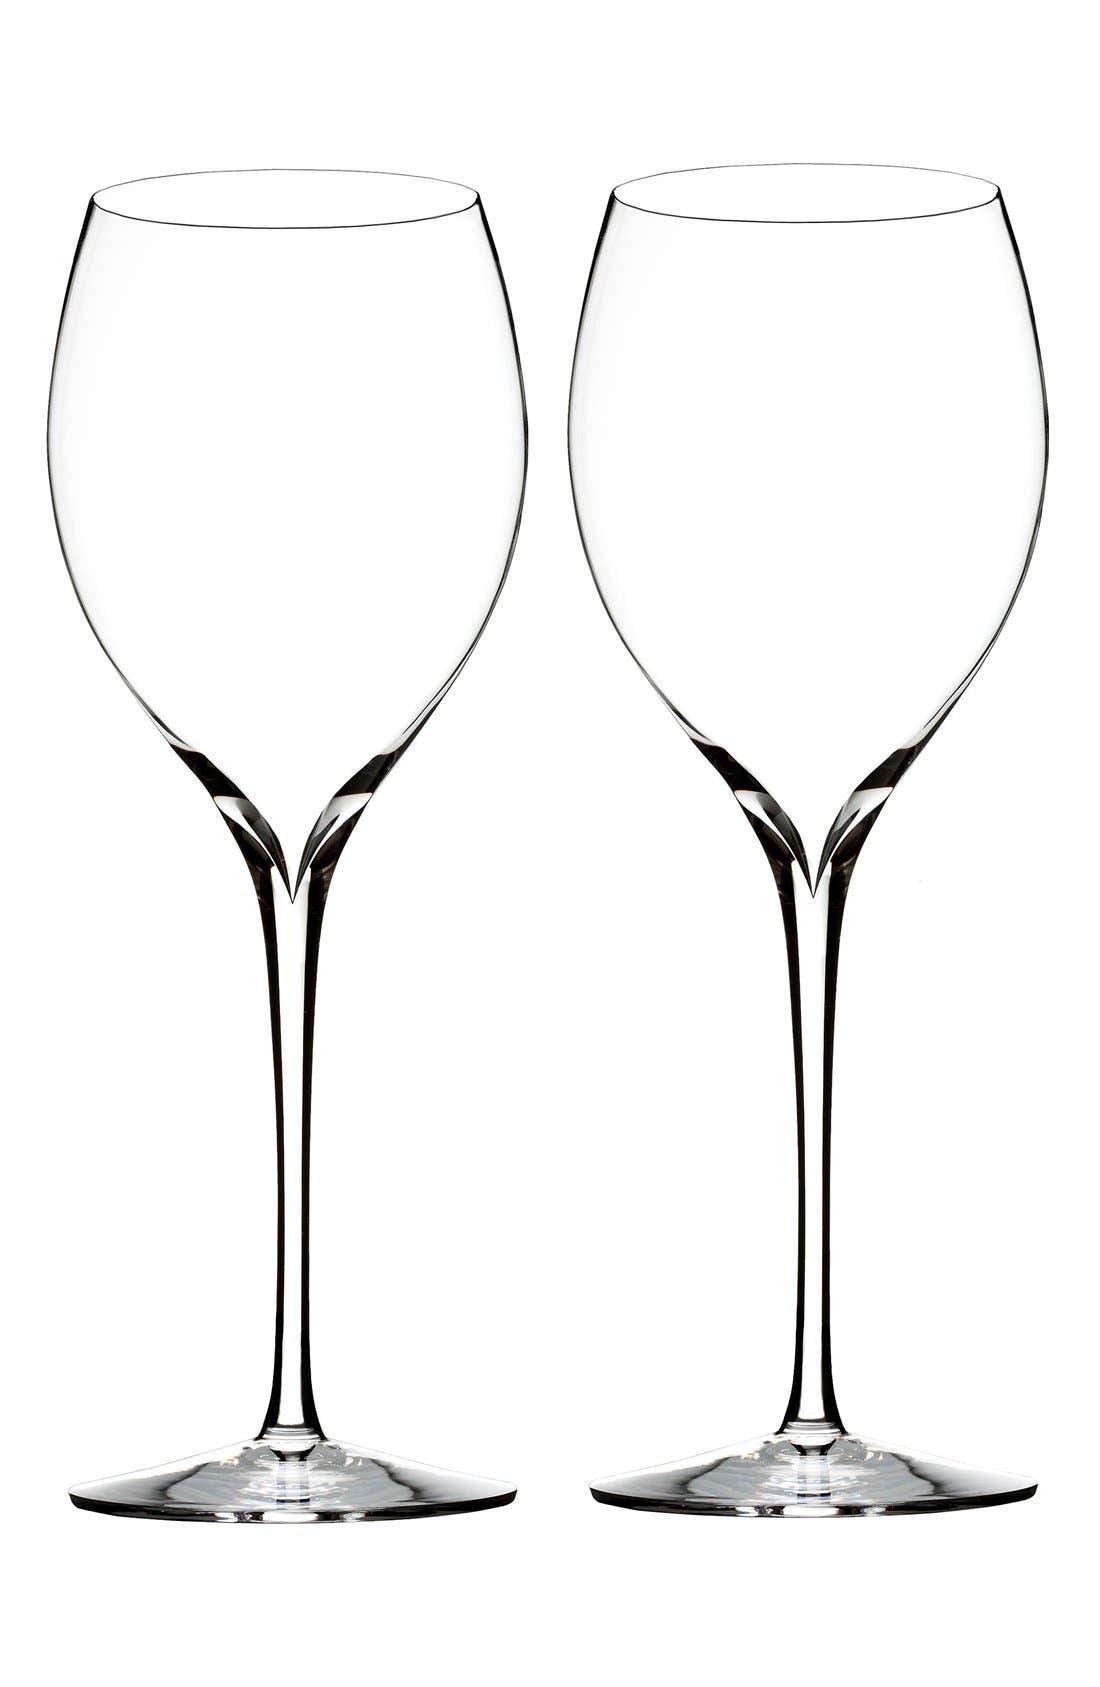 'Elegance' Fine Crystal Chardonnay Glasses,                             Main thumbnail 1, color,                             100